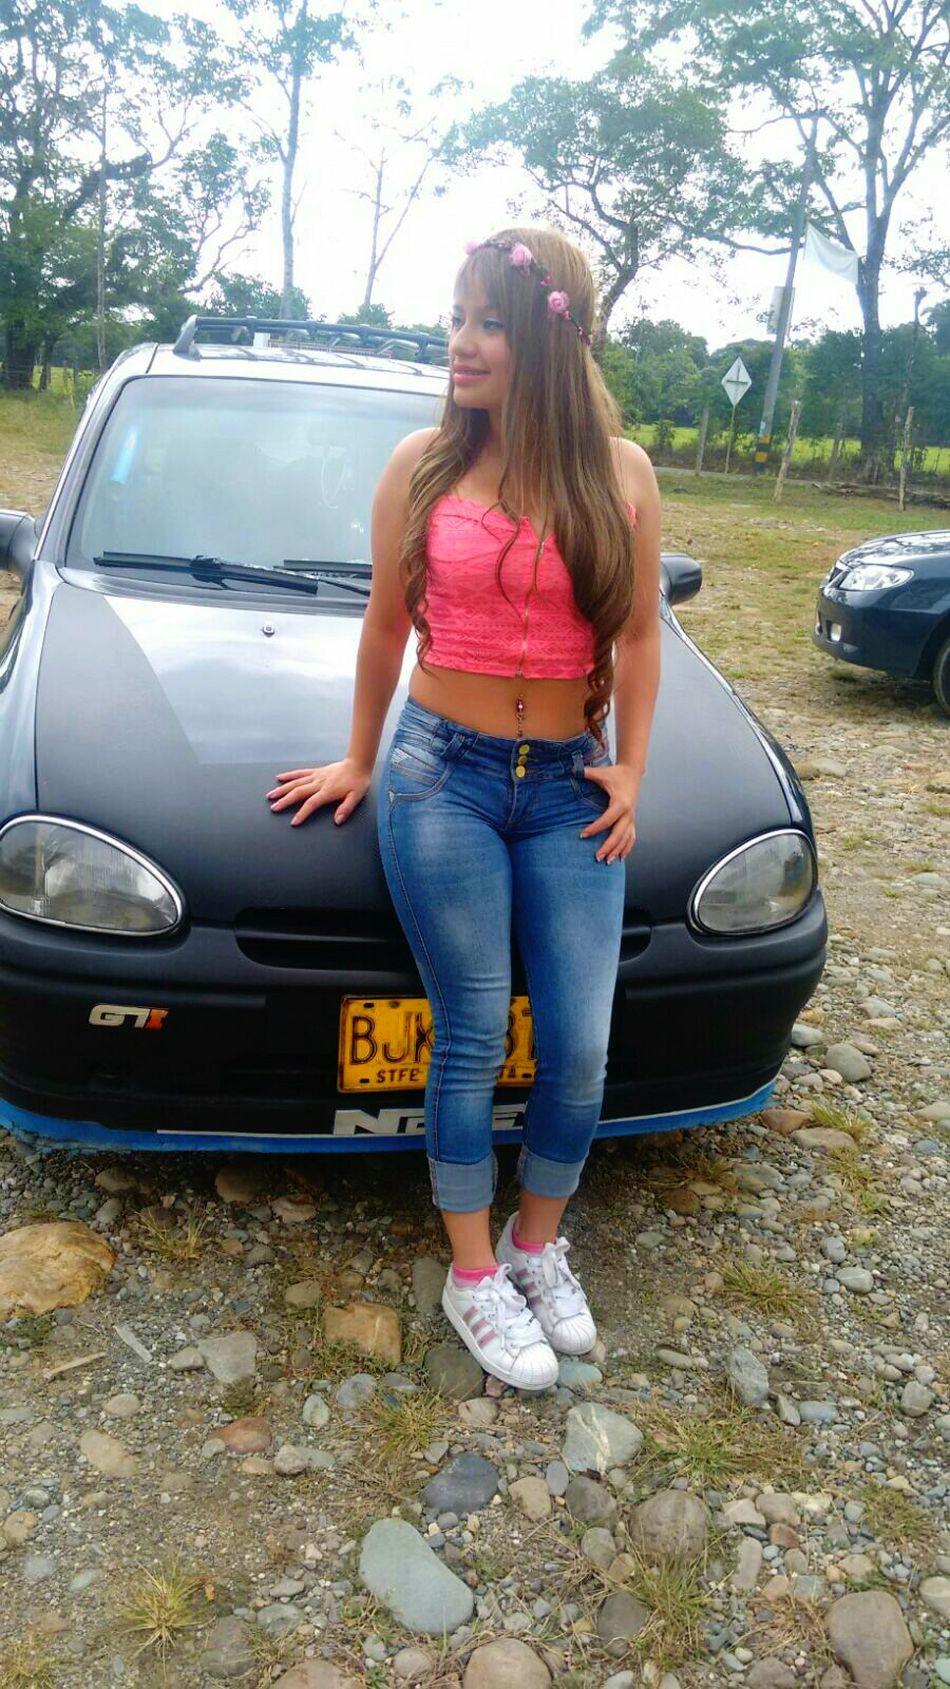 Carro Relaxing Latinalove Beautiful Girl Besitosparatodos LaPrincesita Qeen 👑 Sexylips Cabello 💕🙈👌 Sol Besito💋 Lips #love #smile #pink #cute #pretty